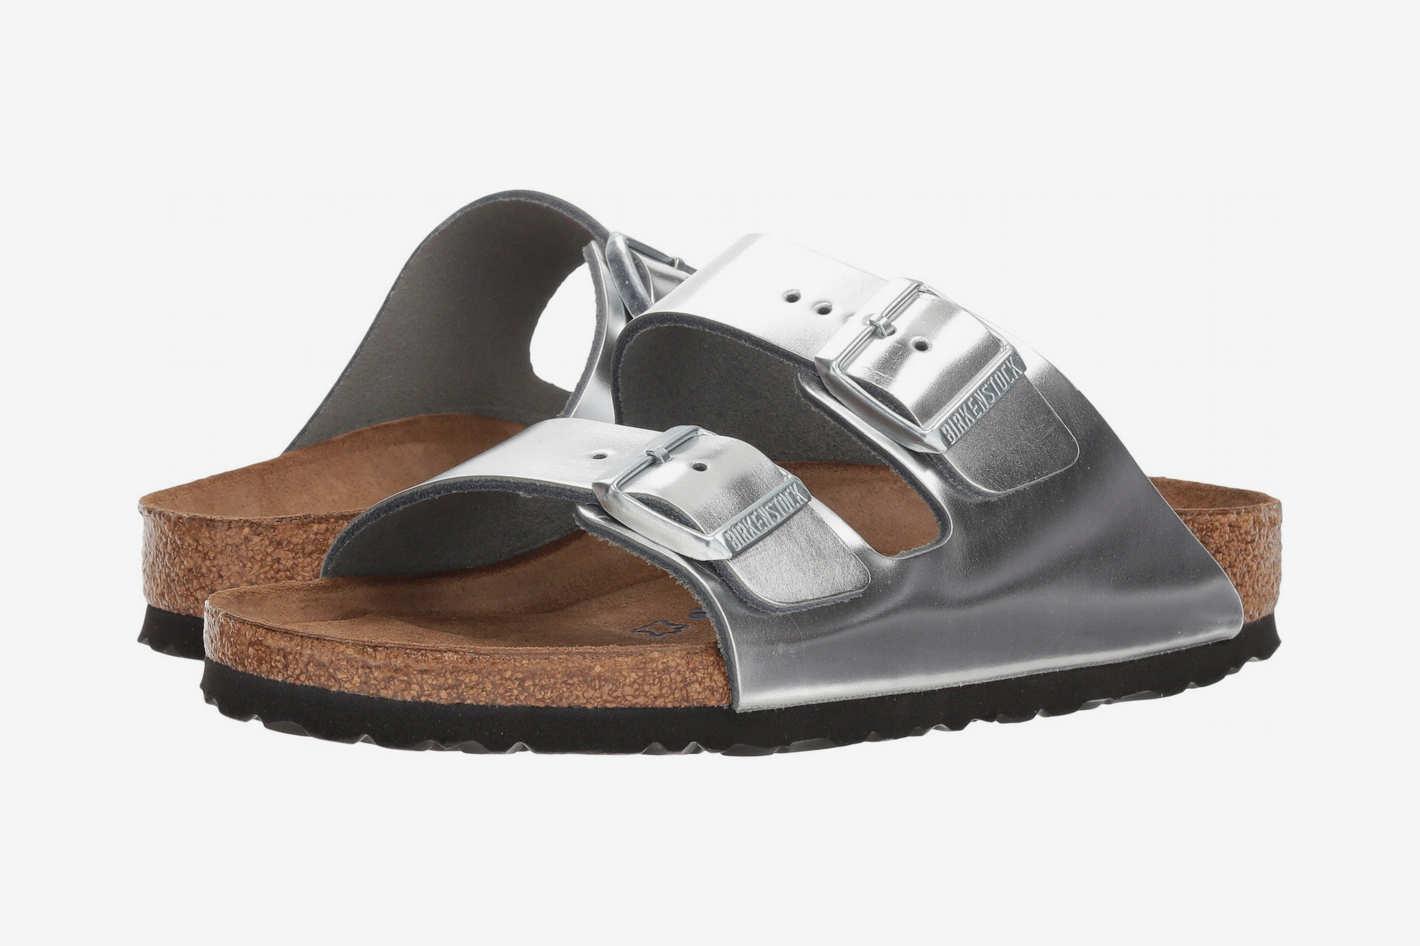 BirkenstockArizona Soft Footbed